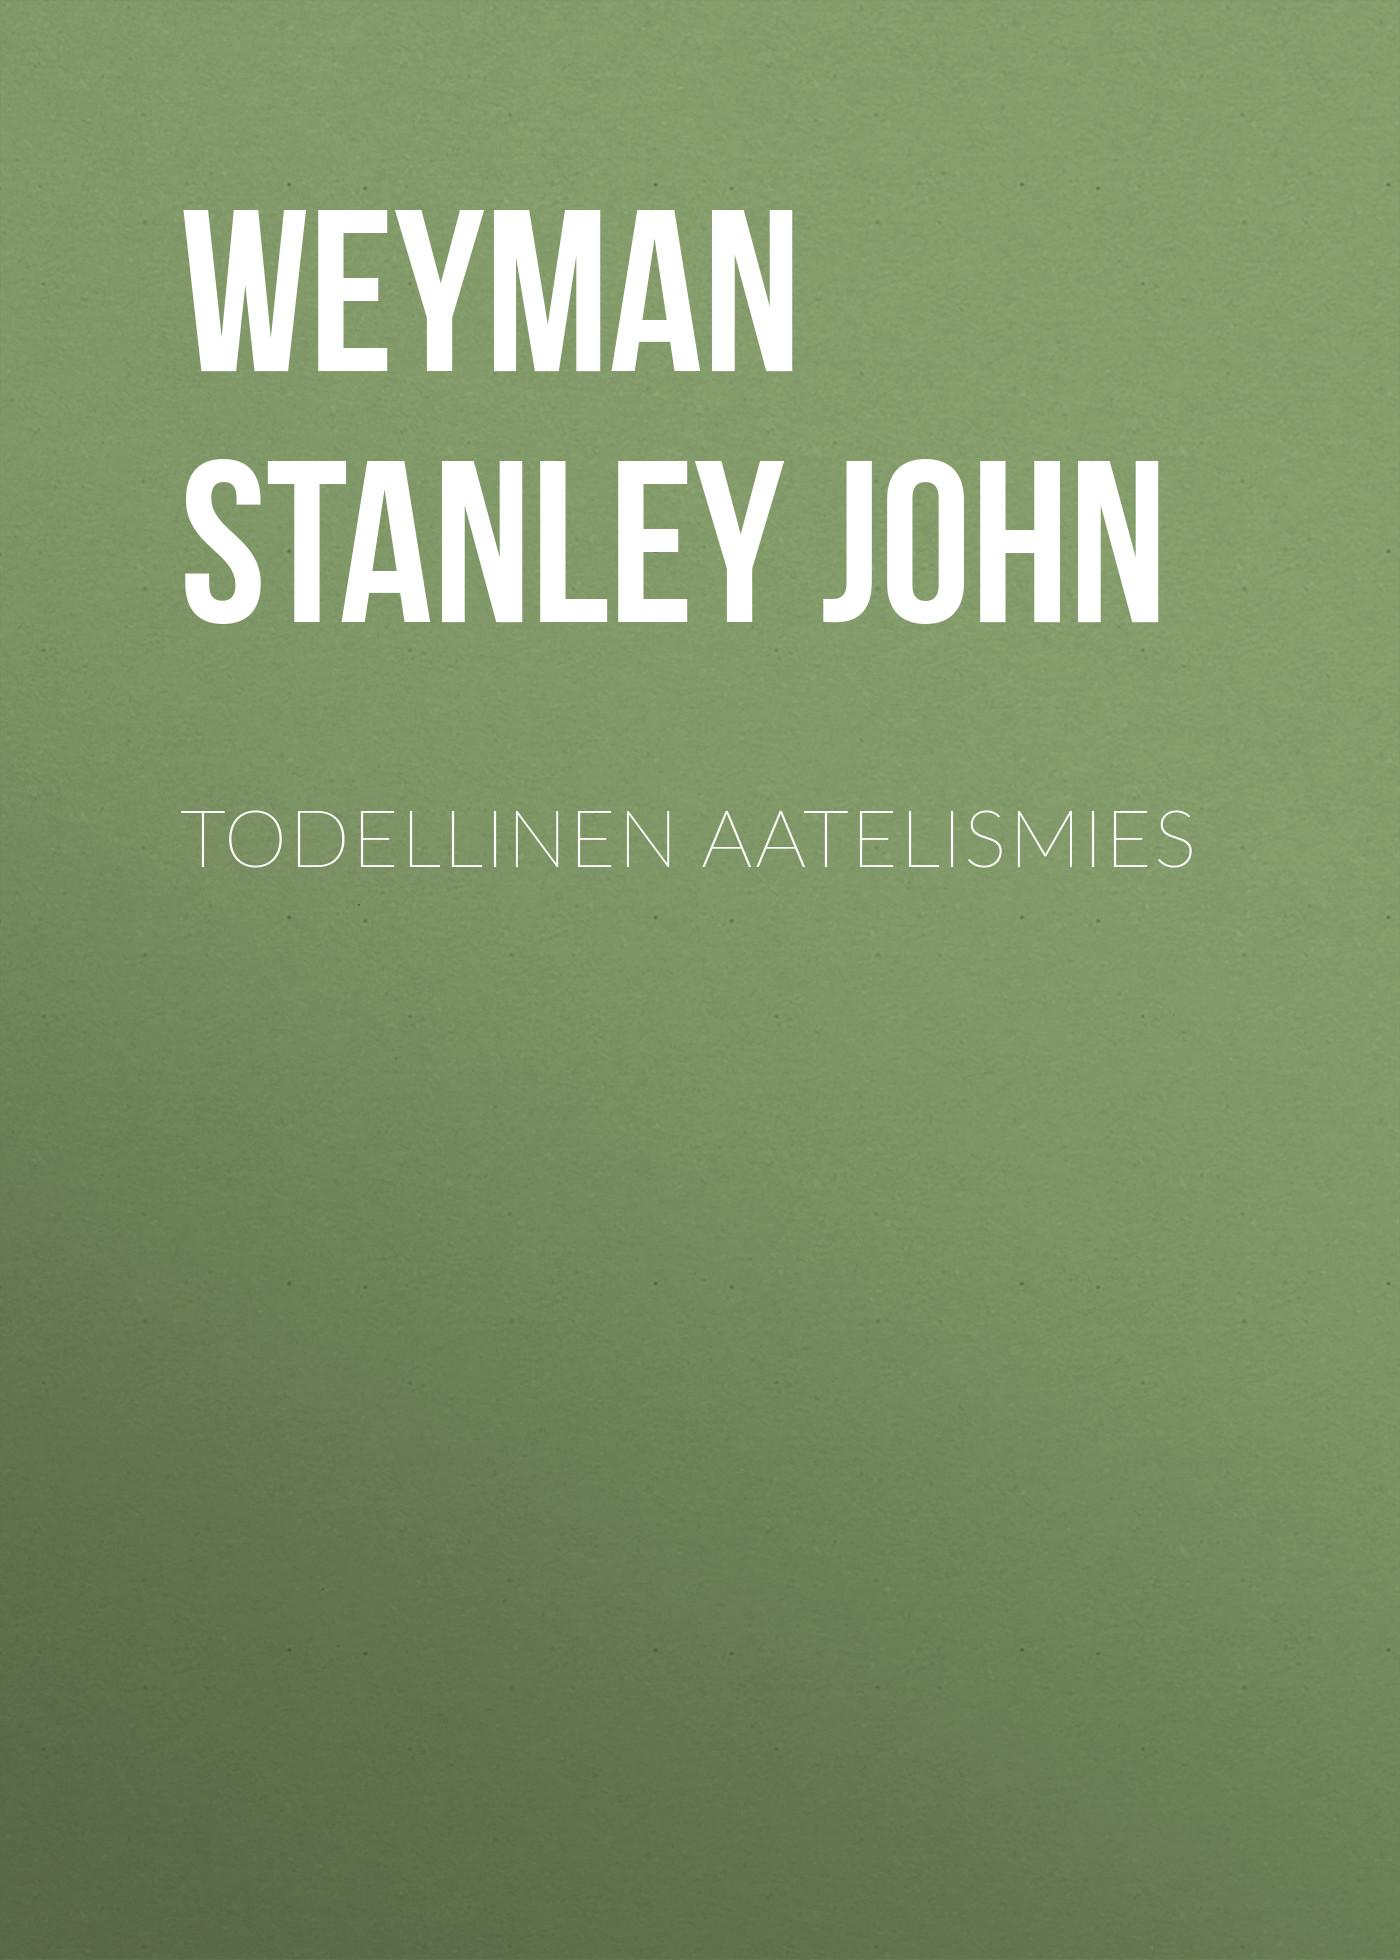 Weyman Stanley John Todellinen aatelismies weyman stanley john the great house